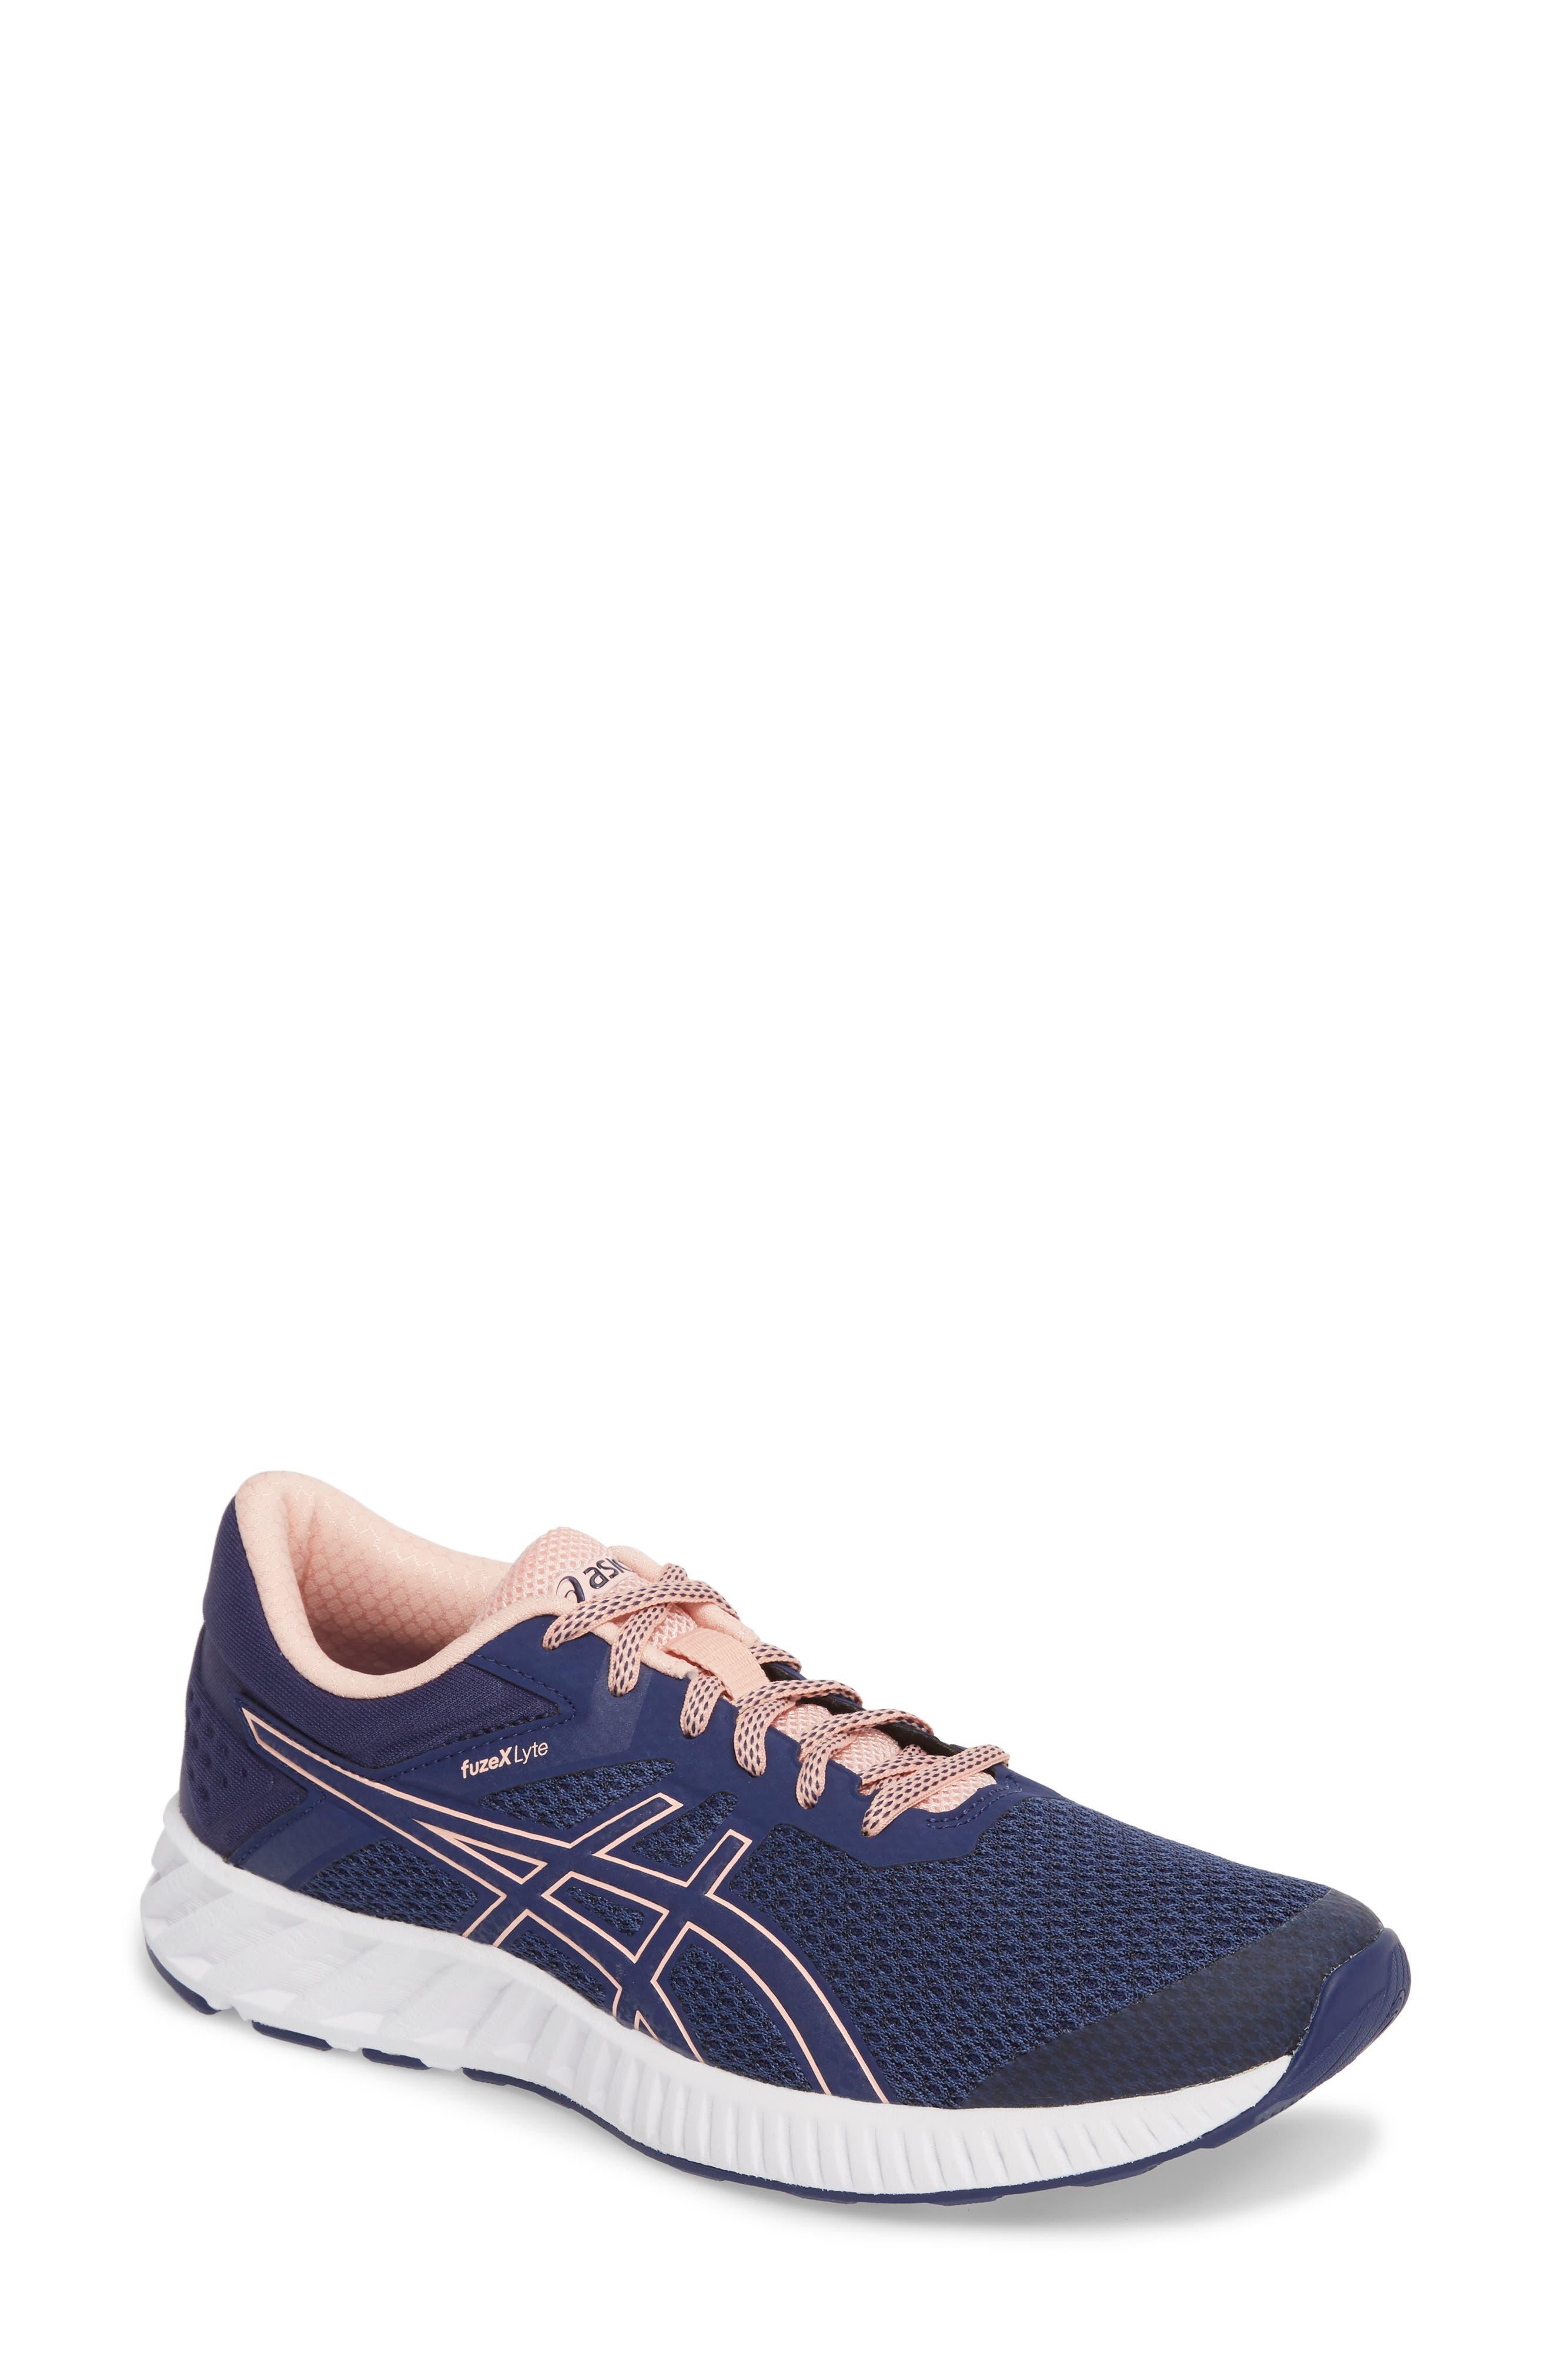 FuzeX Lyte 2 Running Shoe,                         Main,                         color, INDIGO BLUE/ FROSTED ROSE